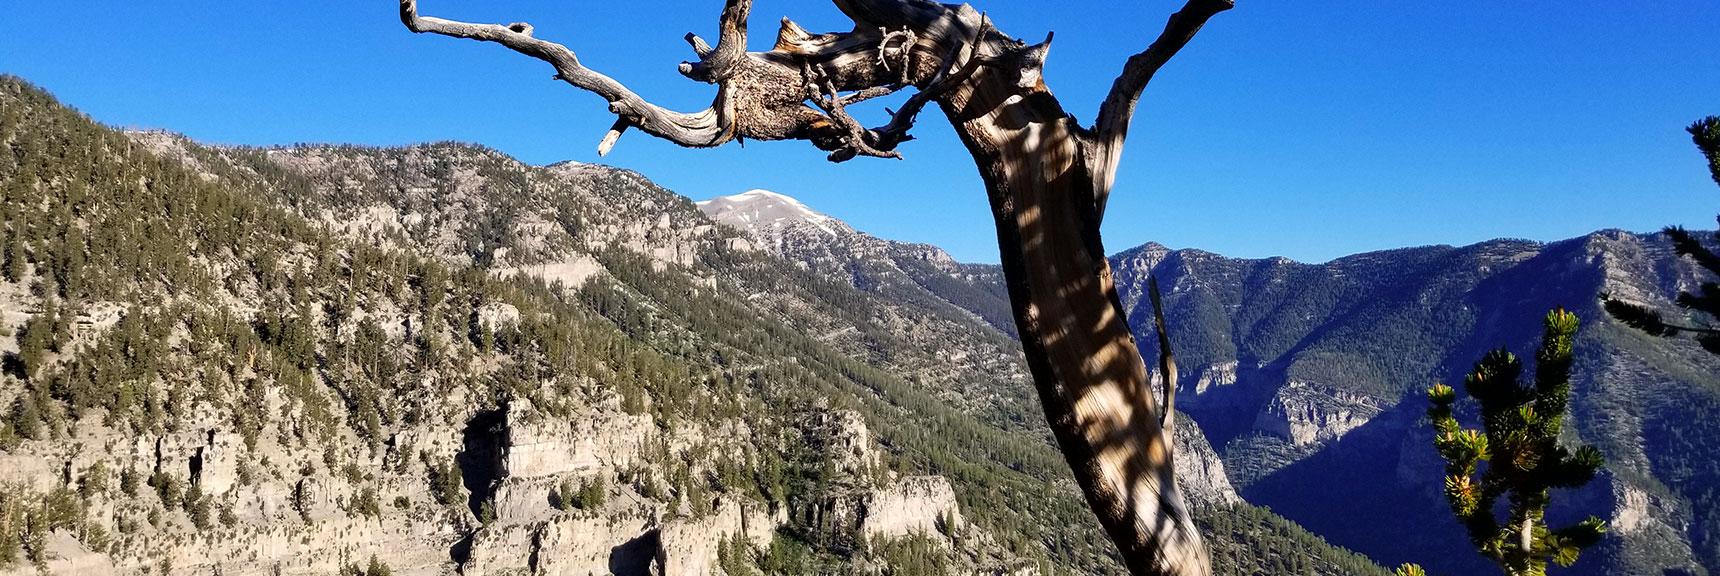 Ribbon-shaped Bristlecone Pine Tree Trunk Framing Mt. Charleston, Nevada